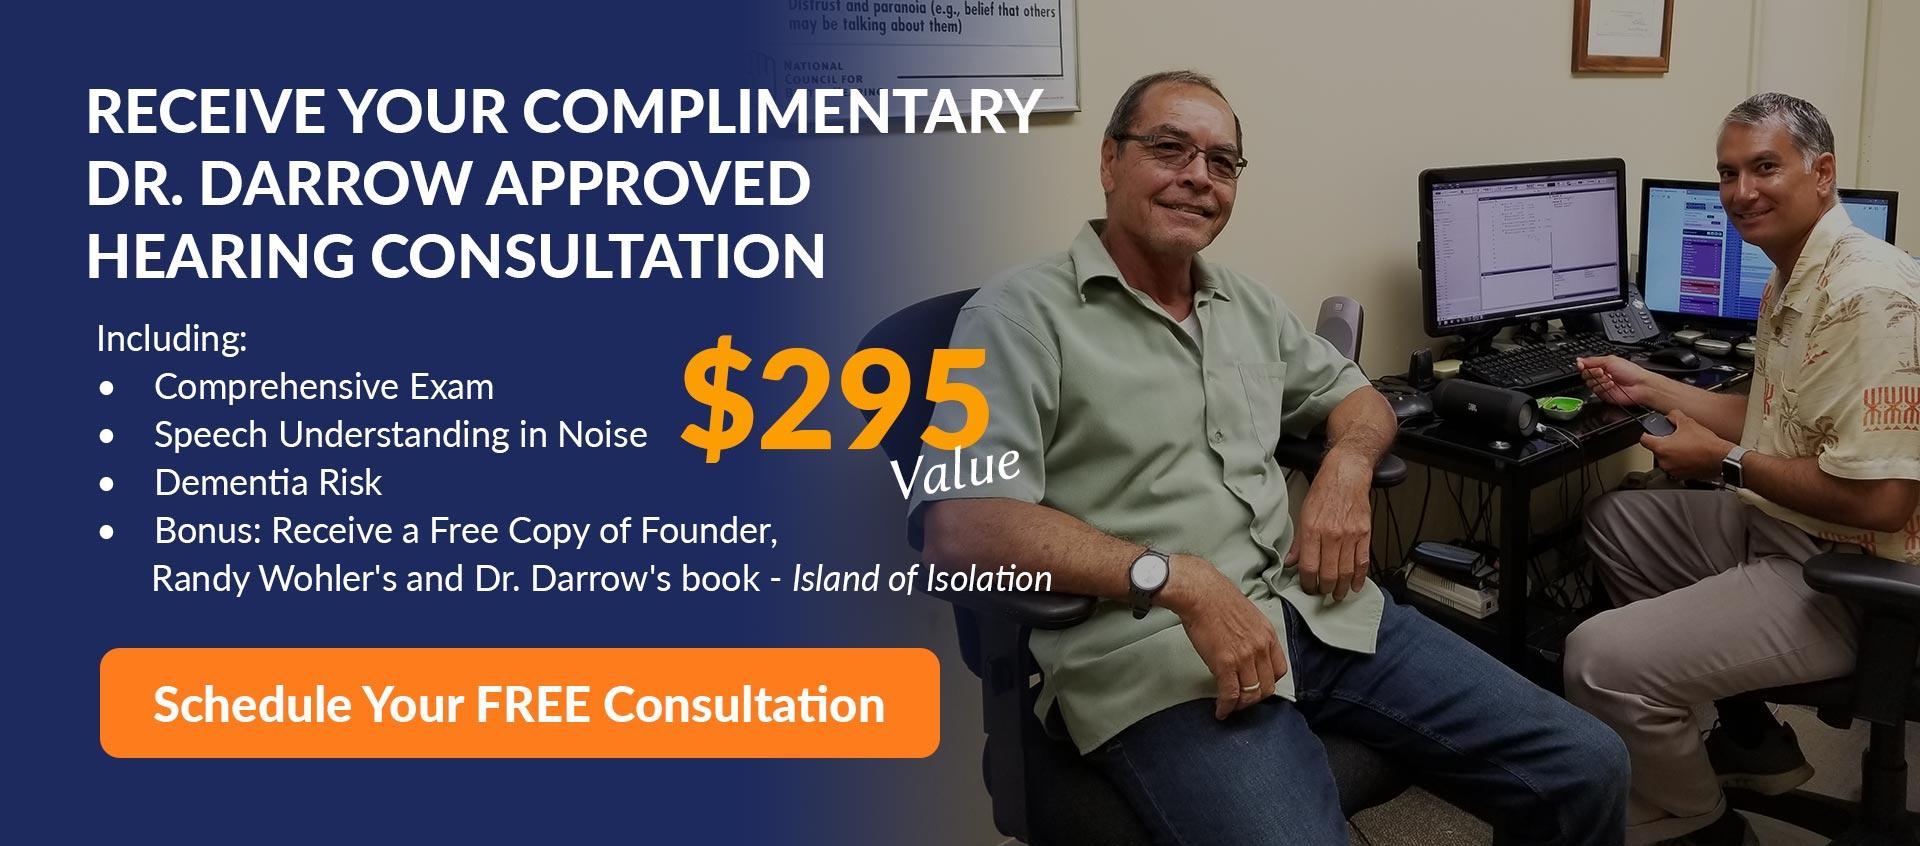 hearing consultation maui hawaii